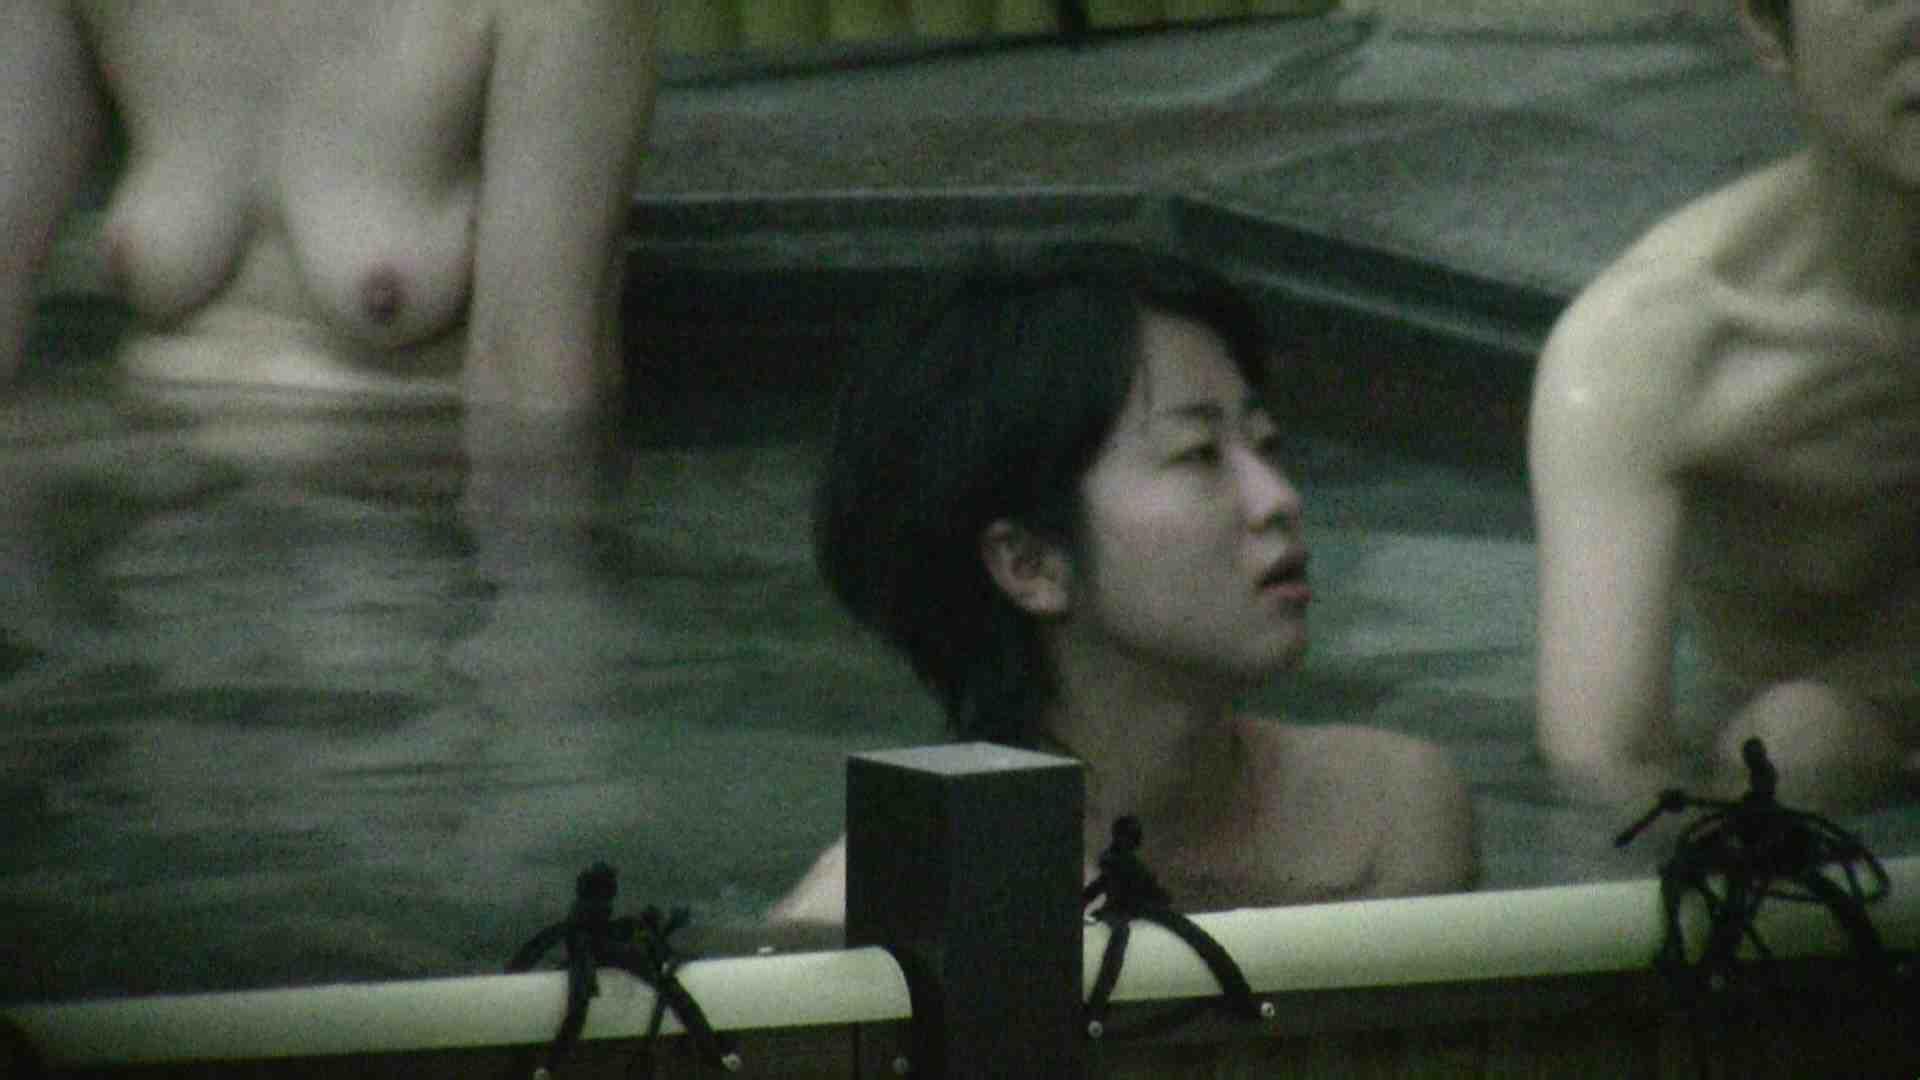 Aquaな露天風呂Vol.112 0 | 0  68連発 65